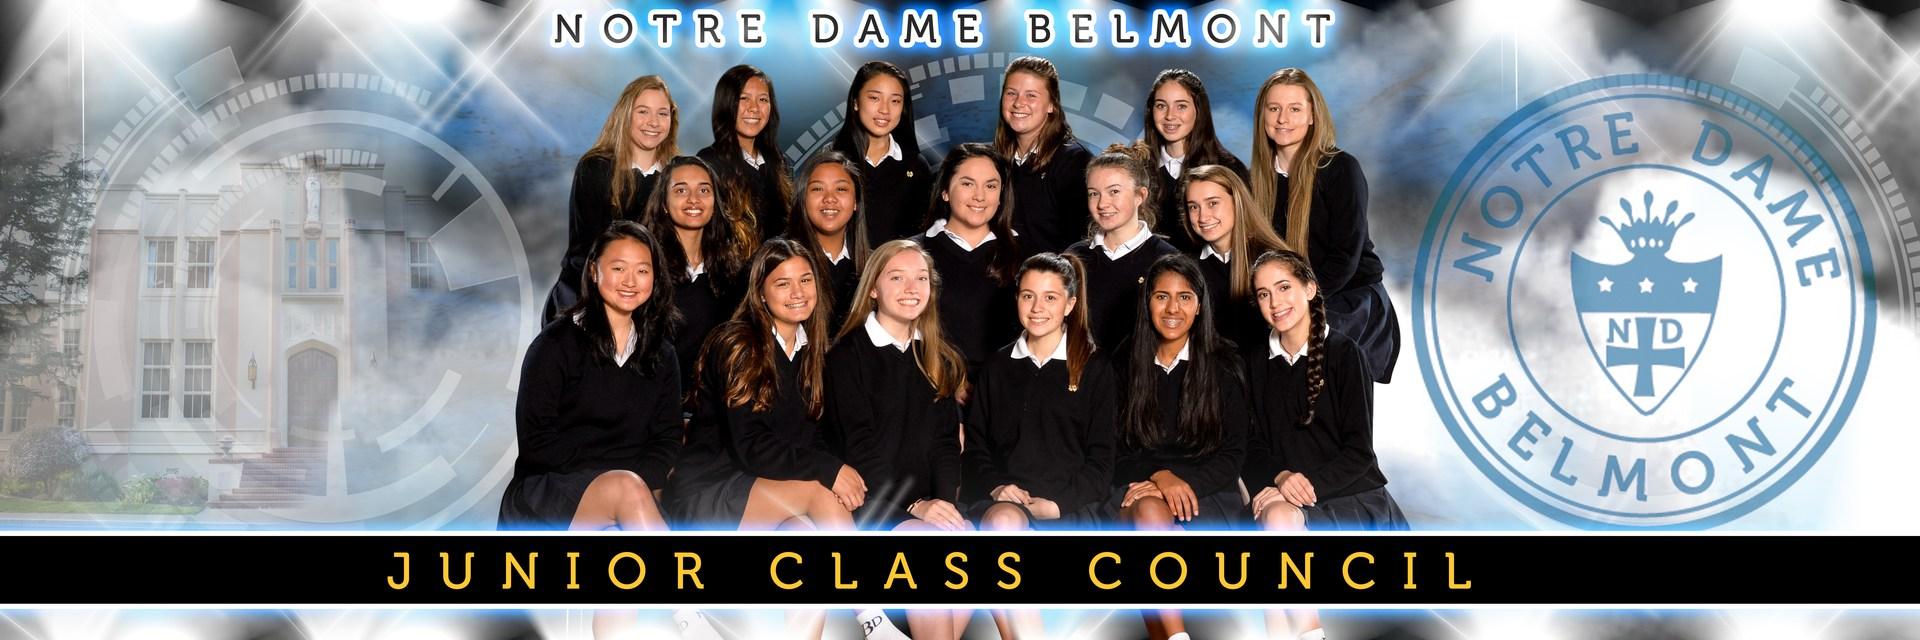 Sophomore Class Council